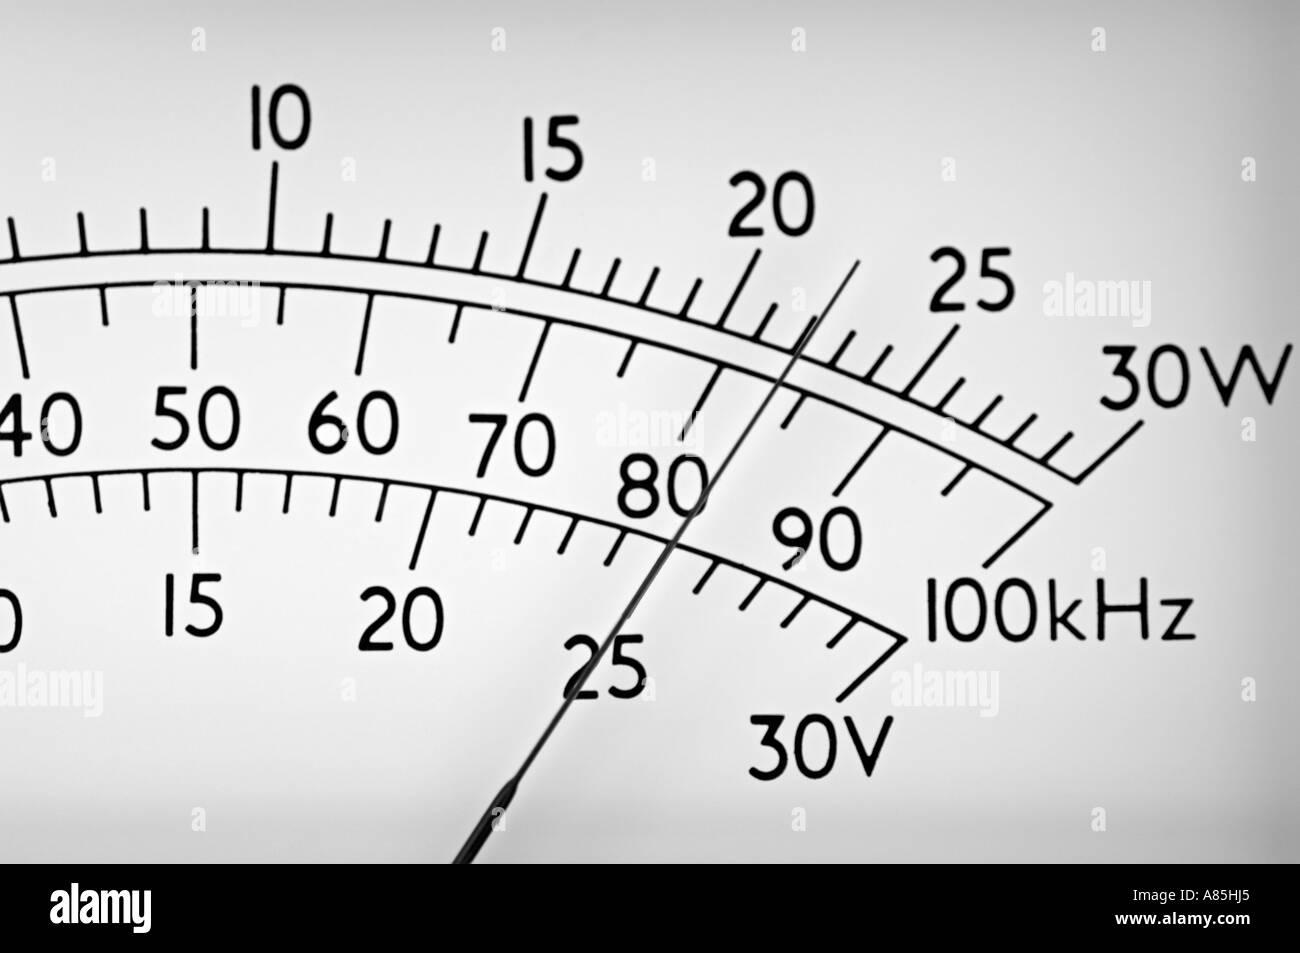 Meter Display, Close Up. - Stock Image